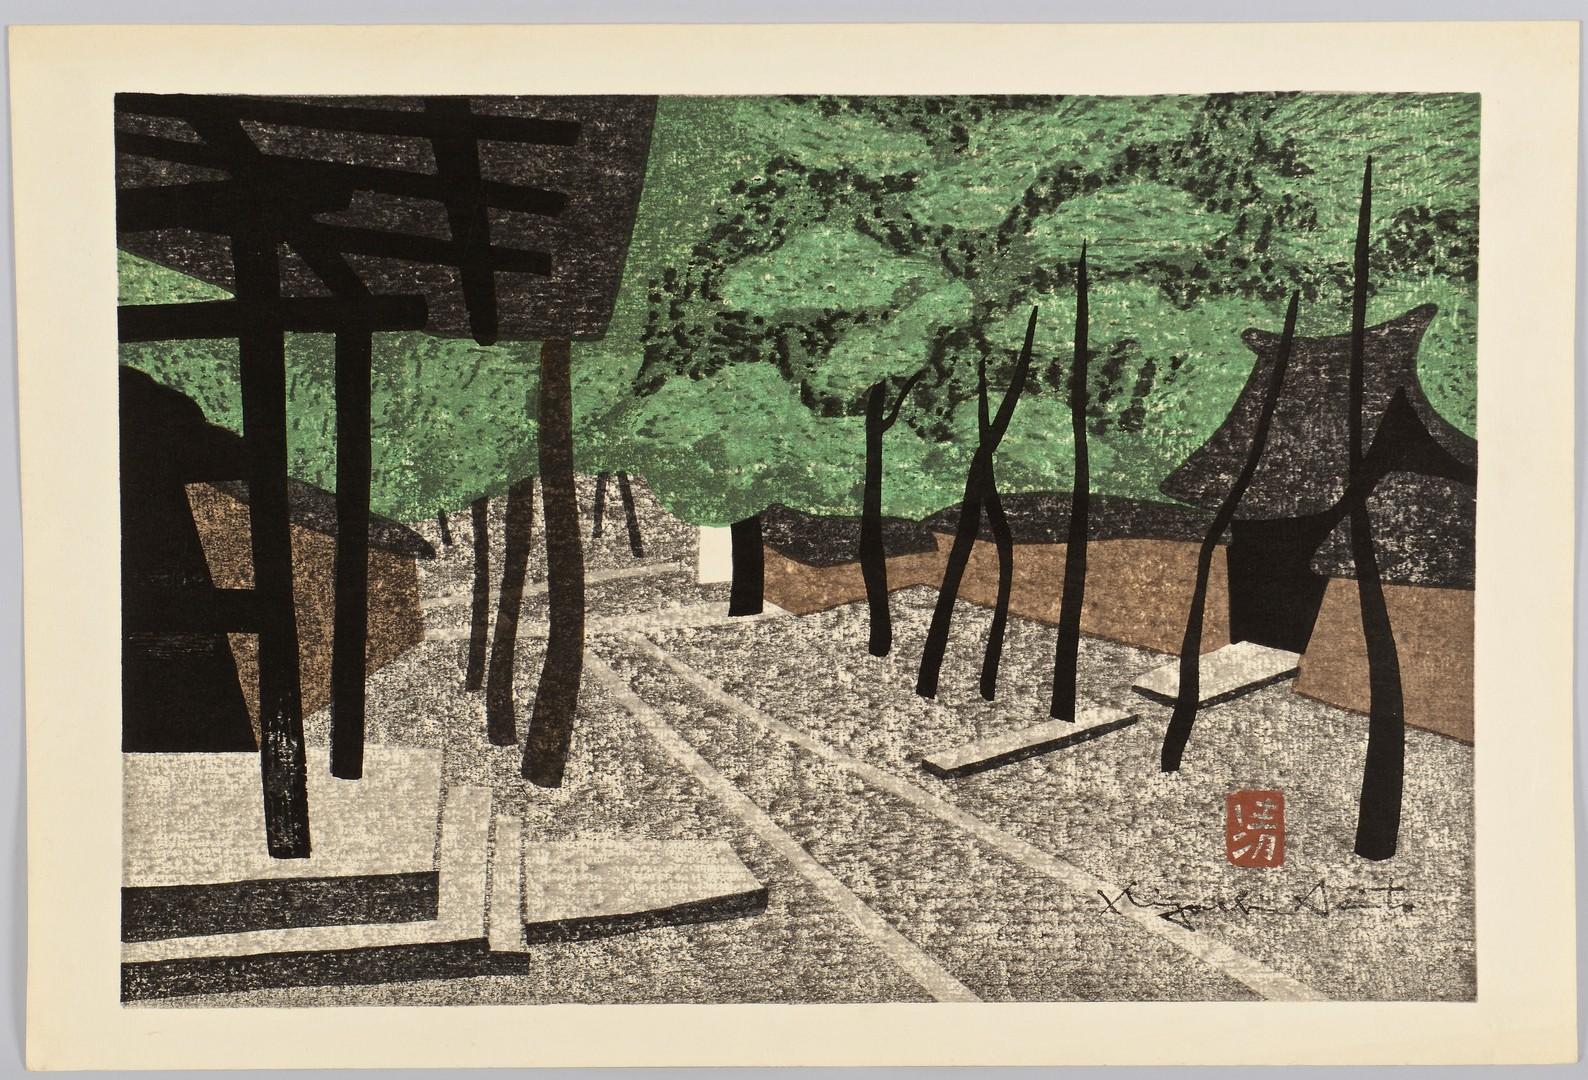 Lot 3832405: Saito, Kyoshi: 3 Landscape Woodblocks